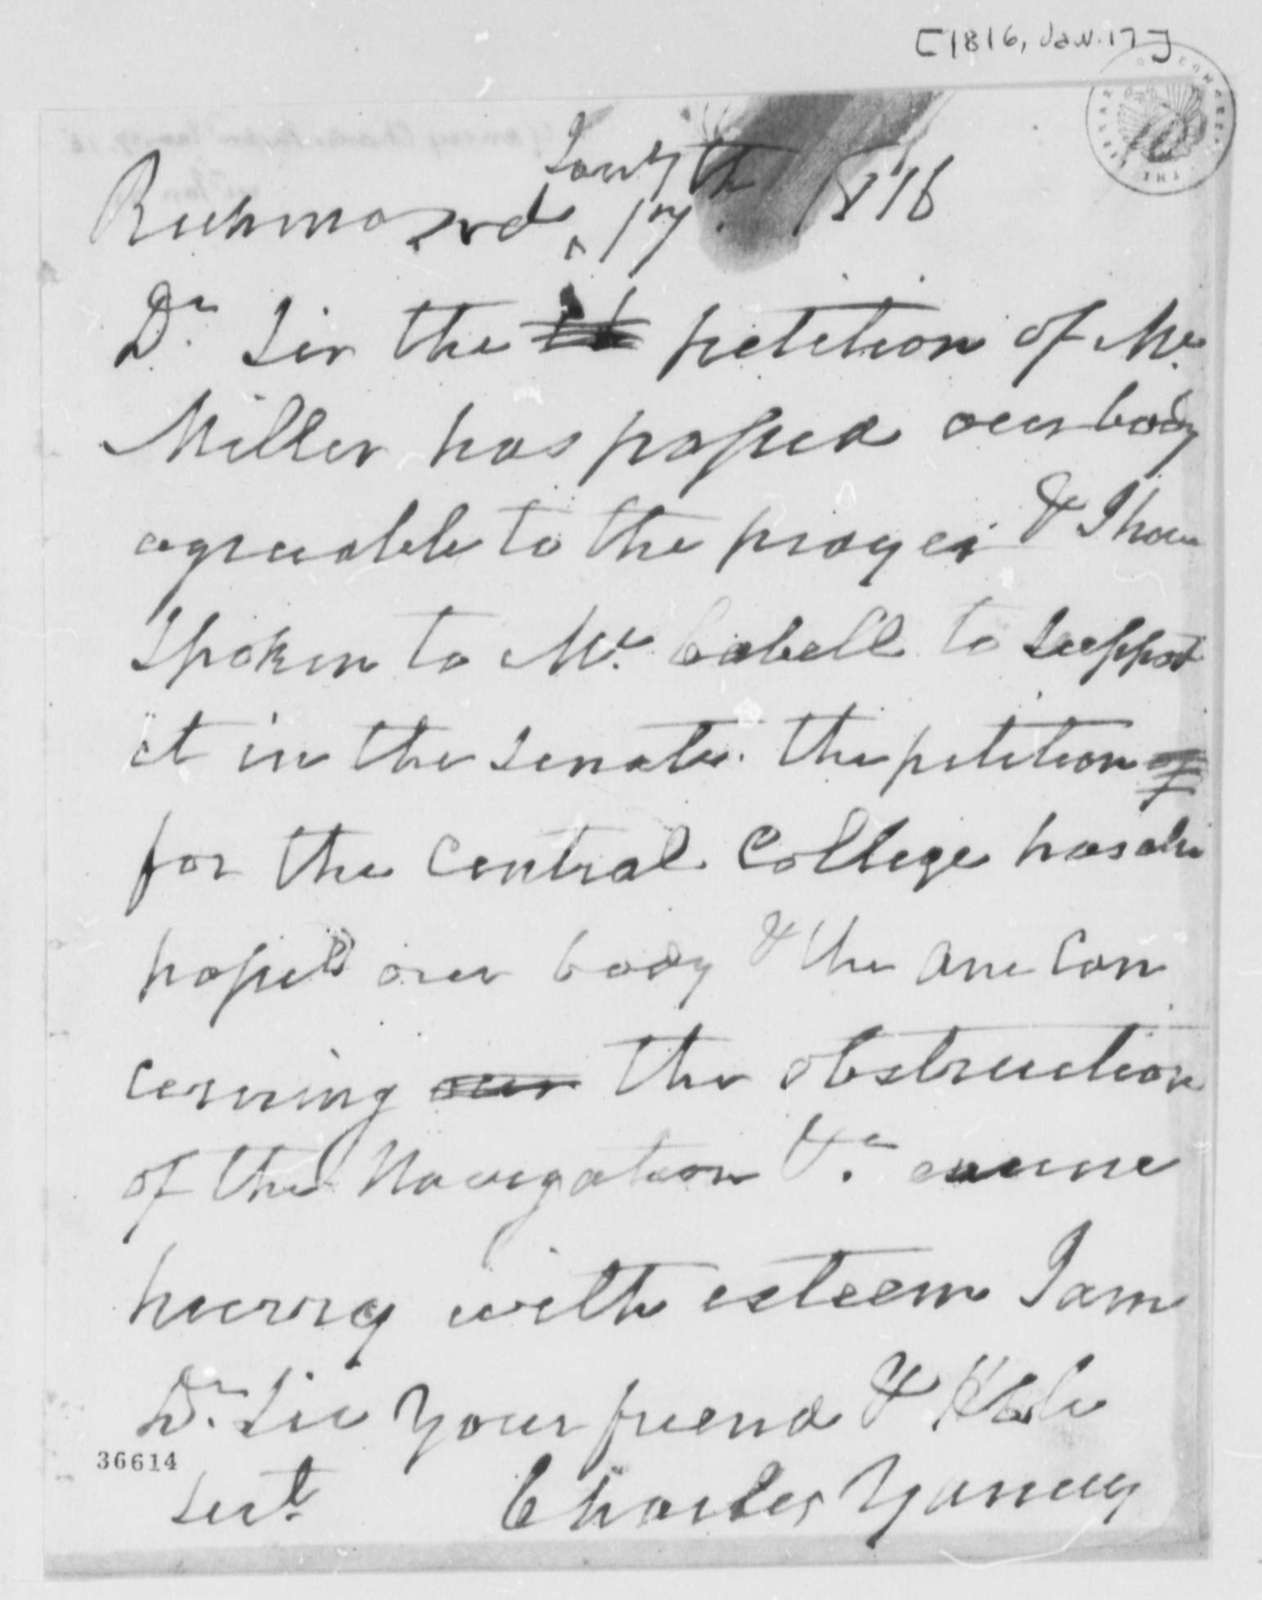 Charles Yancey to Thomas Jefferson, January 17, 1816